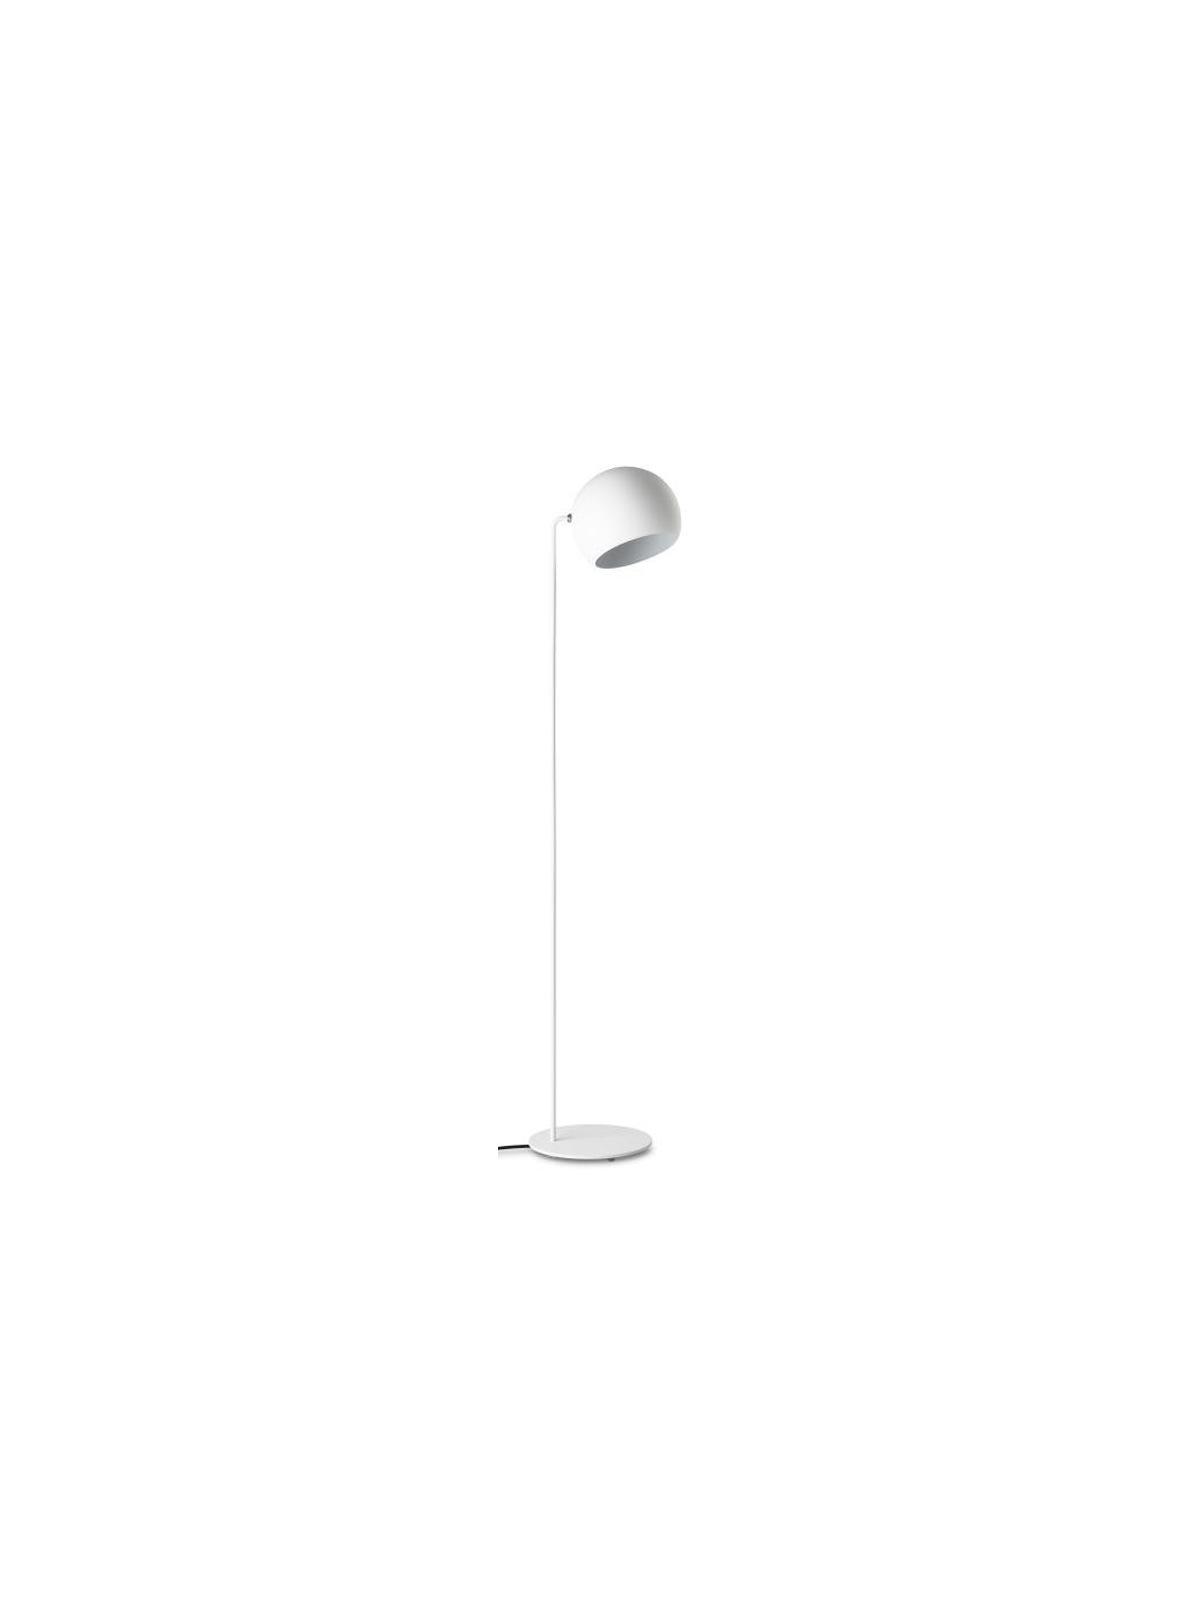 NYTA Stehlampe Tilt Globe Floor DesignOrt Leuchten Berlin